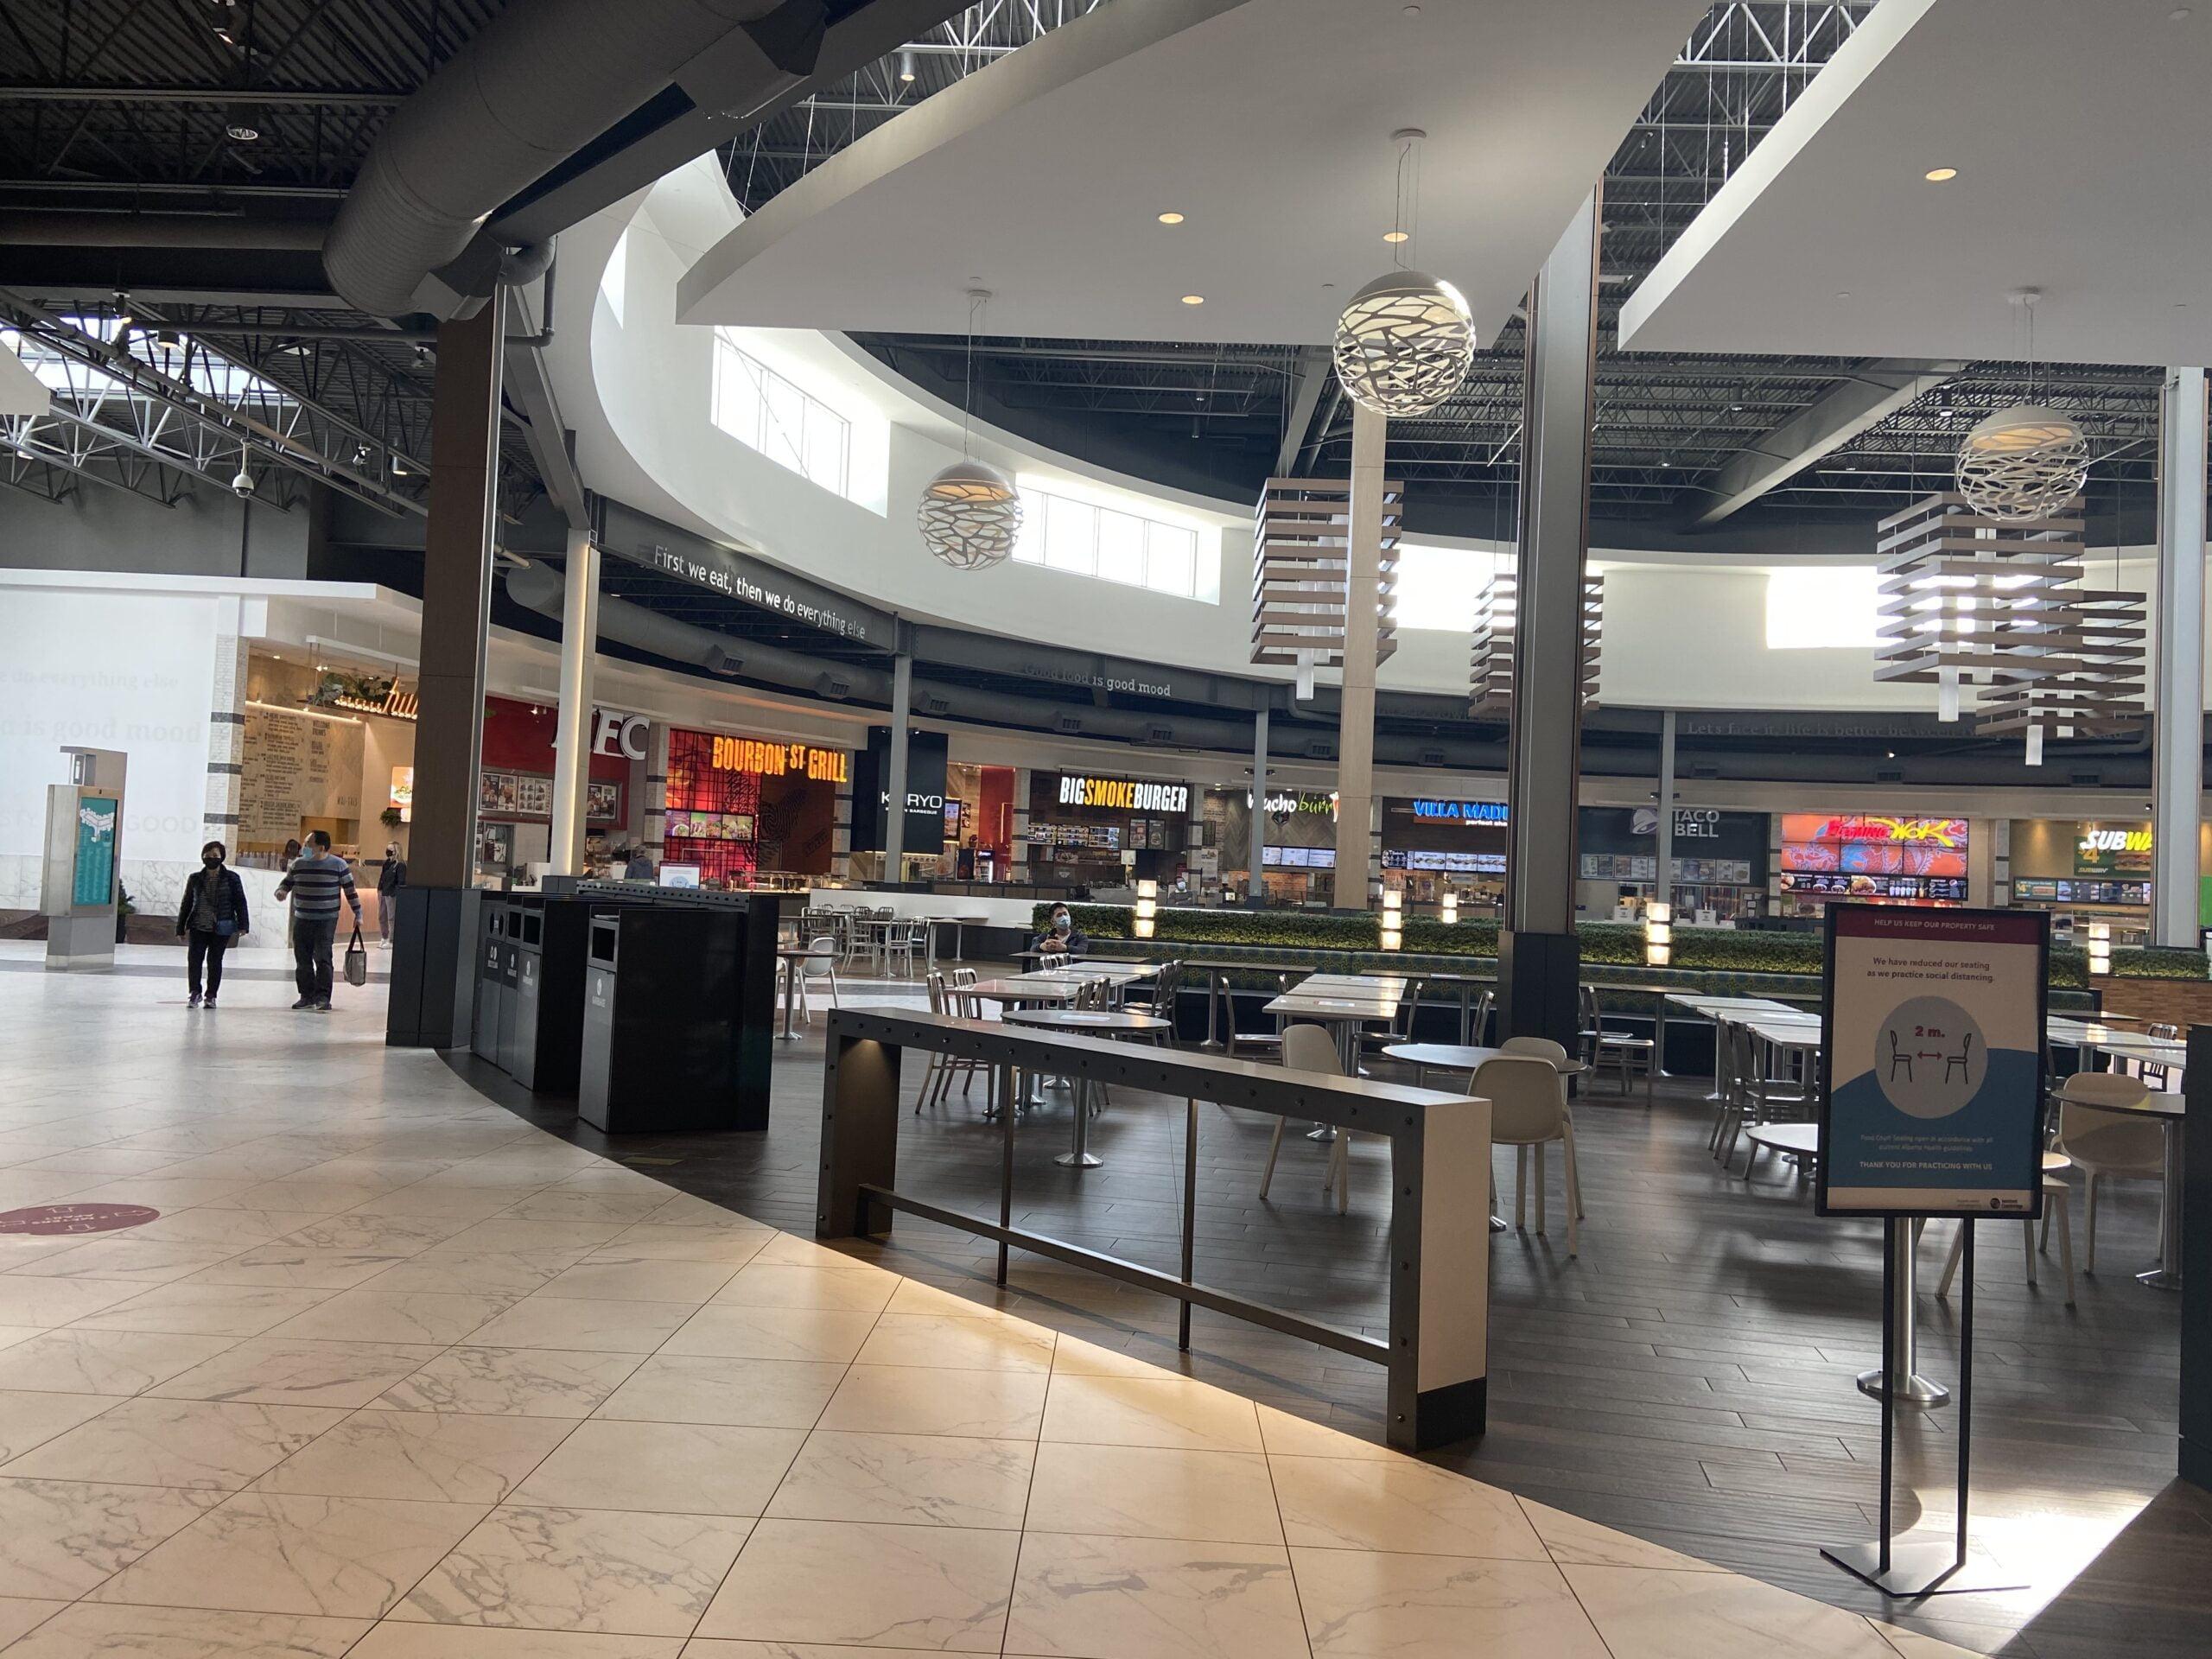 Food Hall at CrossIron Mills